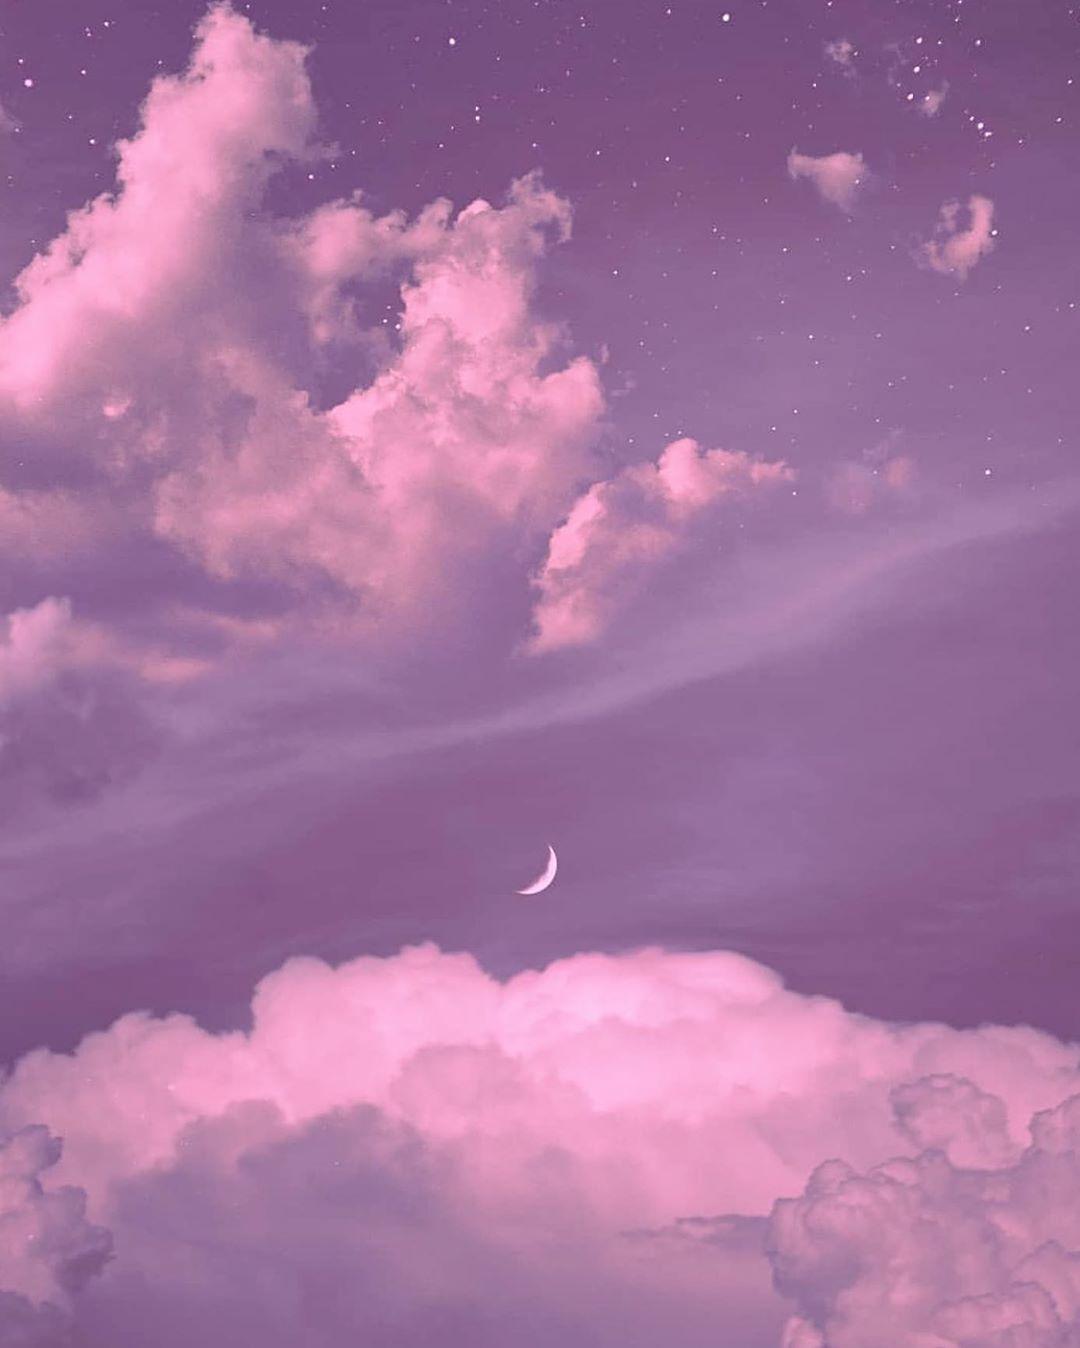 Pin By Garden Design On Travel Sky Aesthetic Aesthetic Pastel Wallpaper Purple Wallpaper Cute purple aesthetic wallpaper clouds